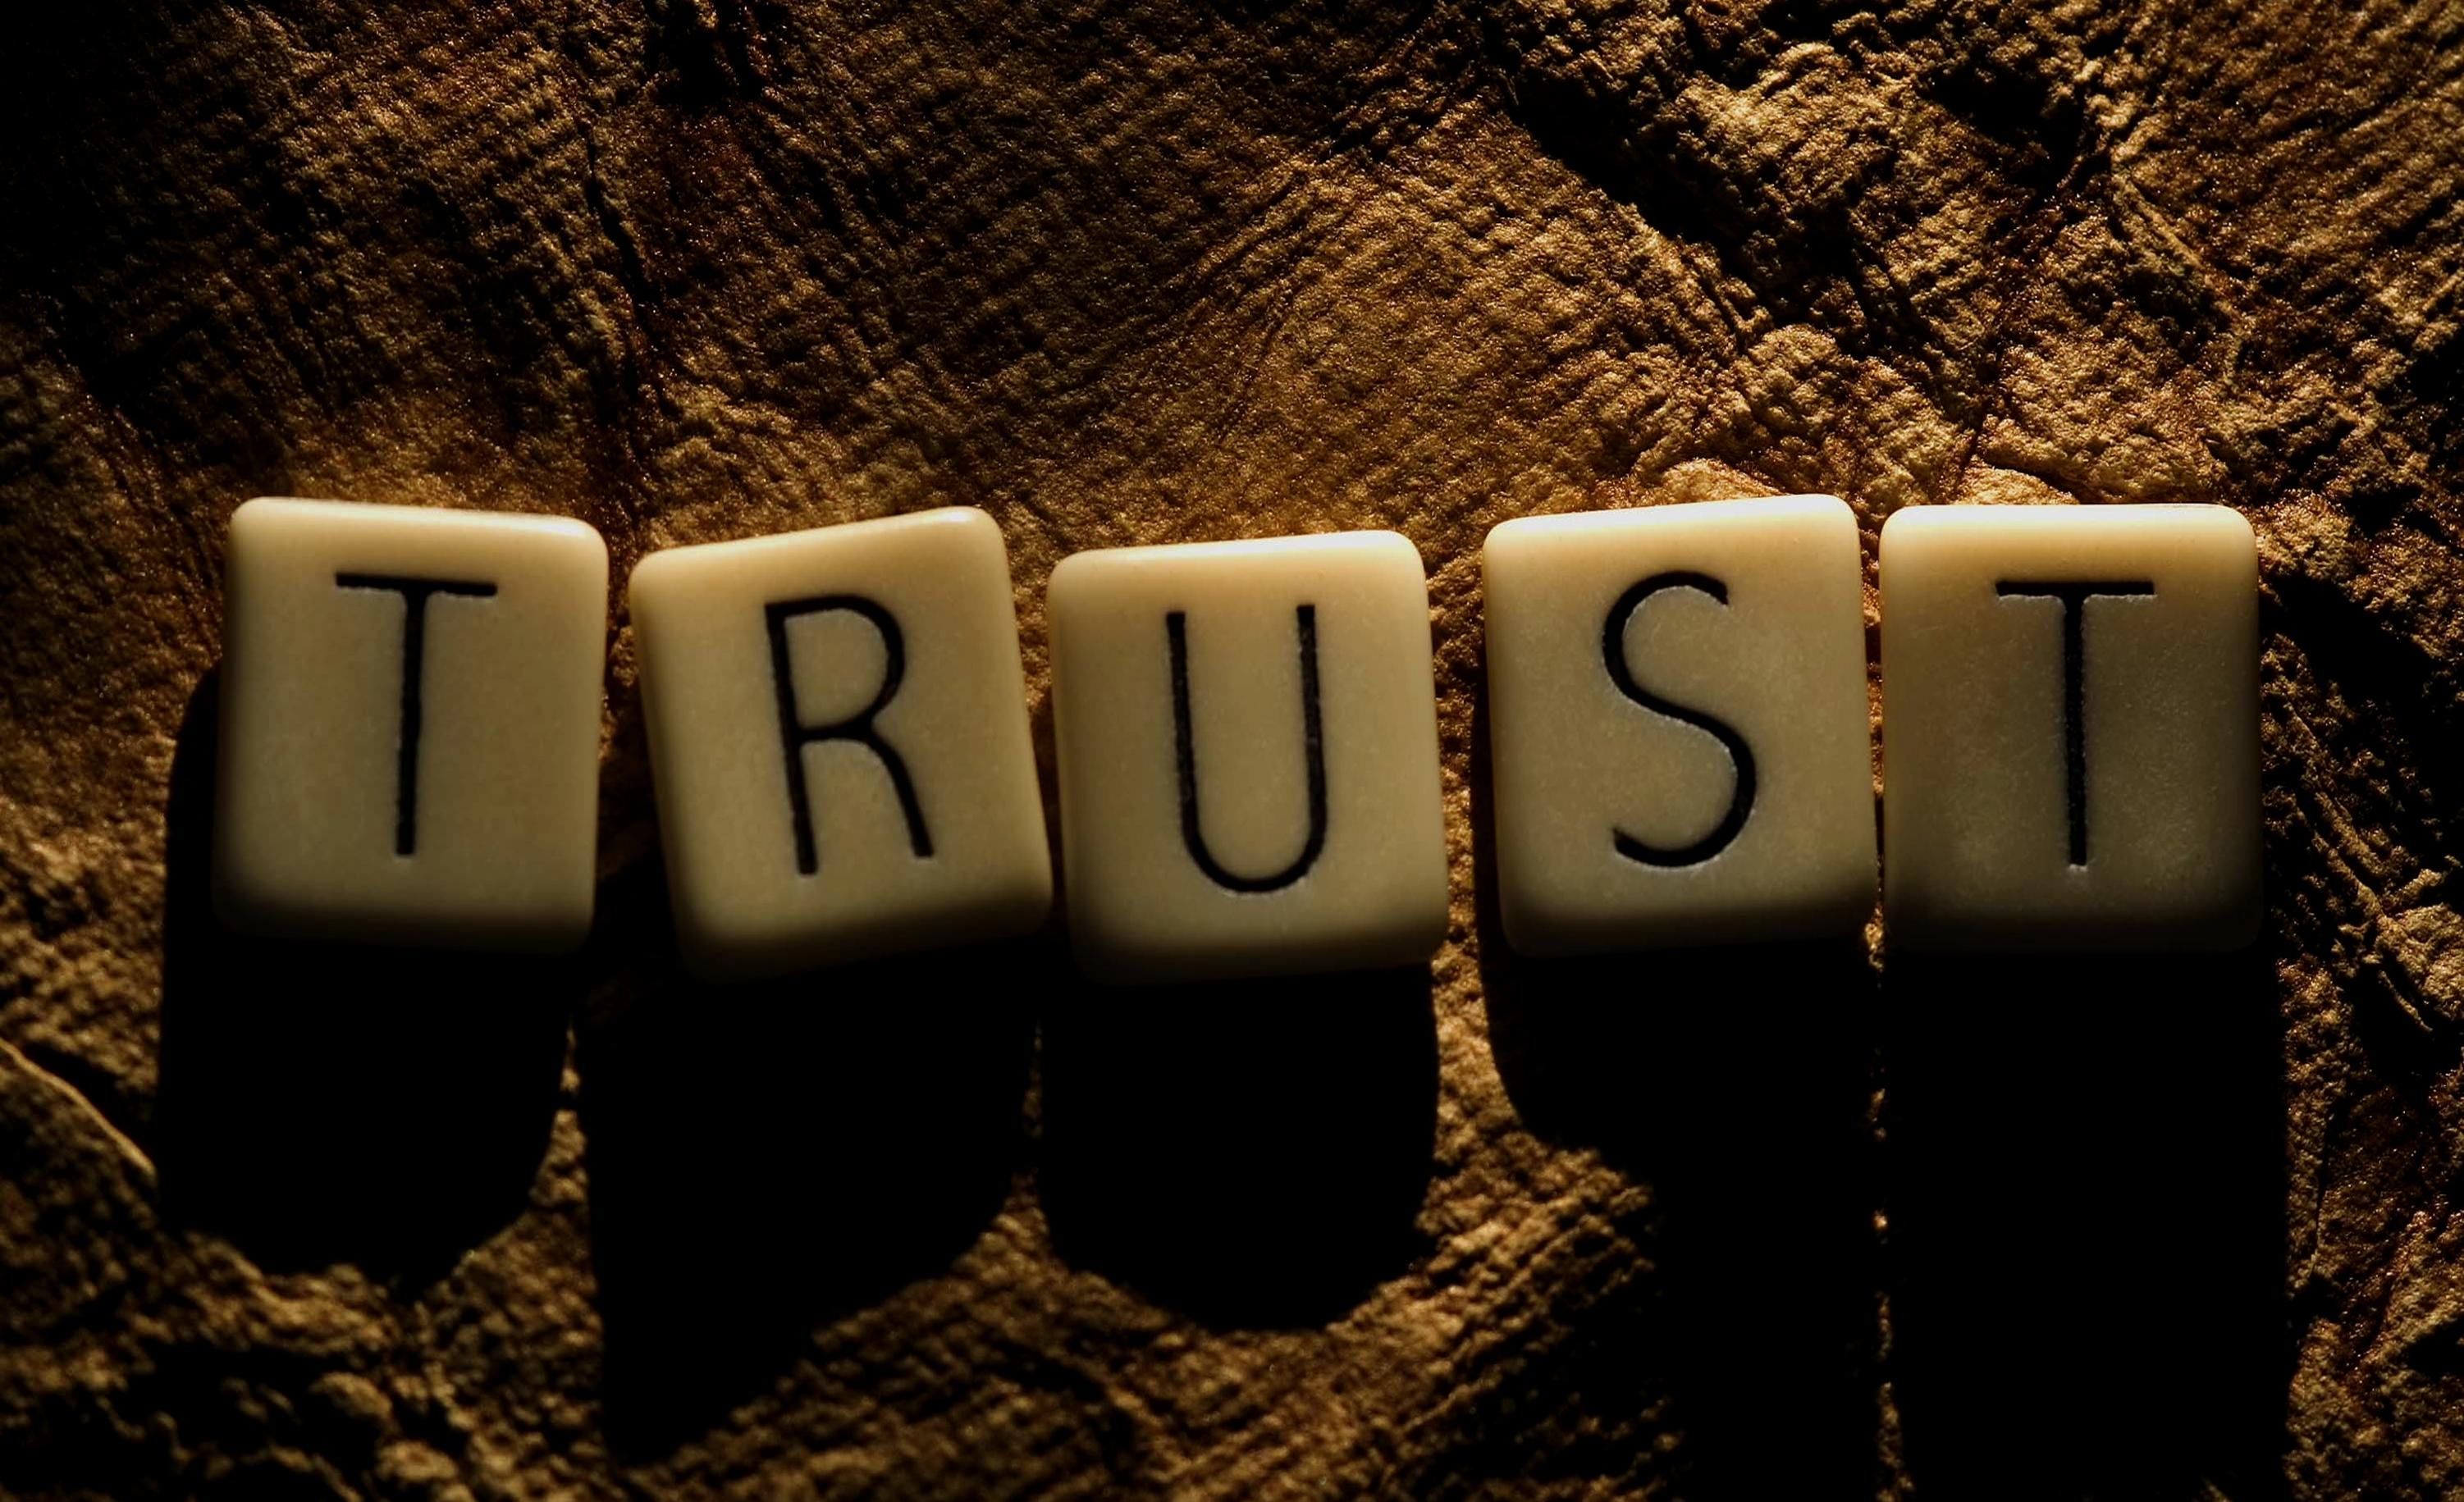 trustsermonimage_1.jpg